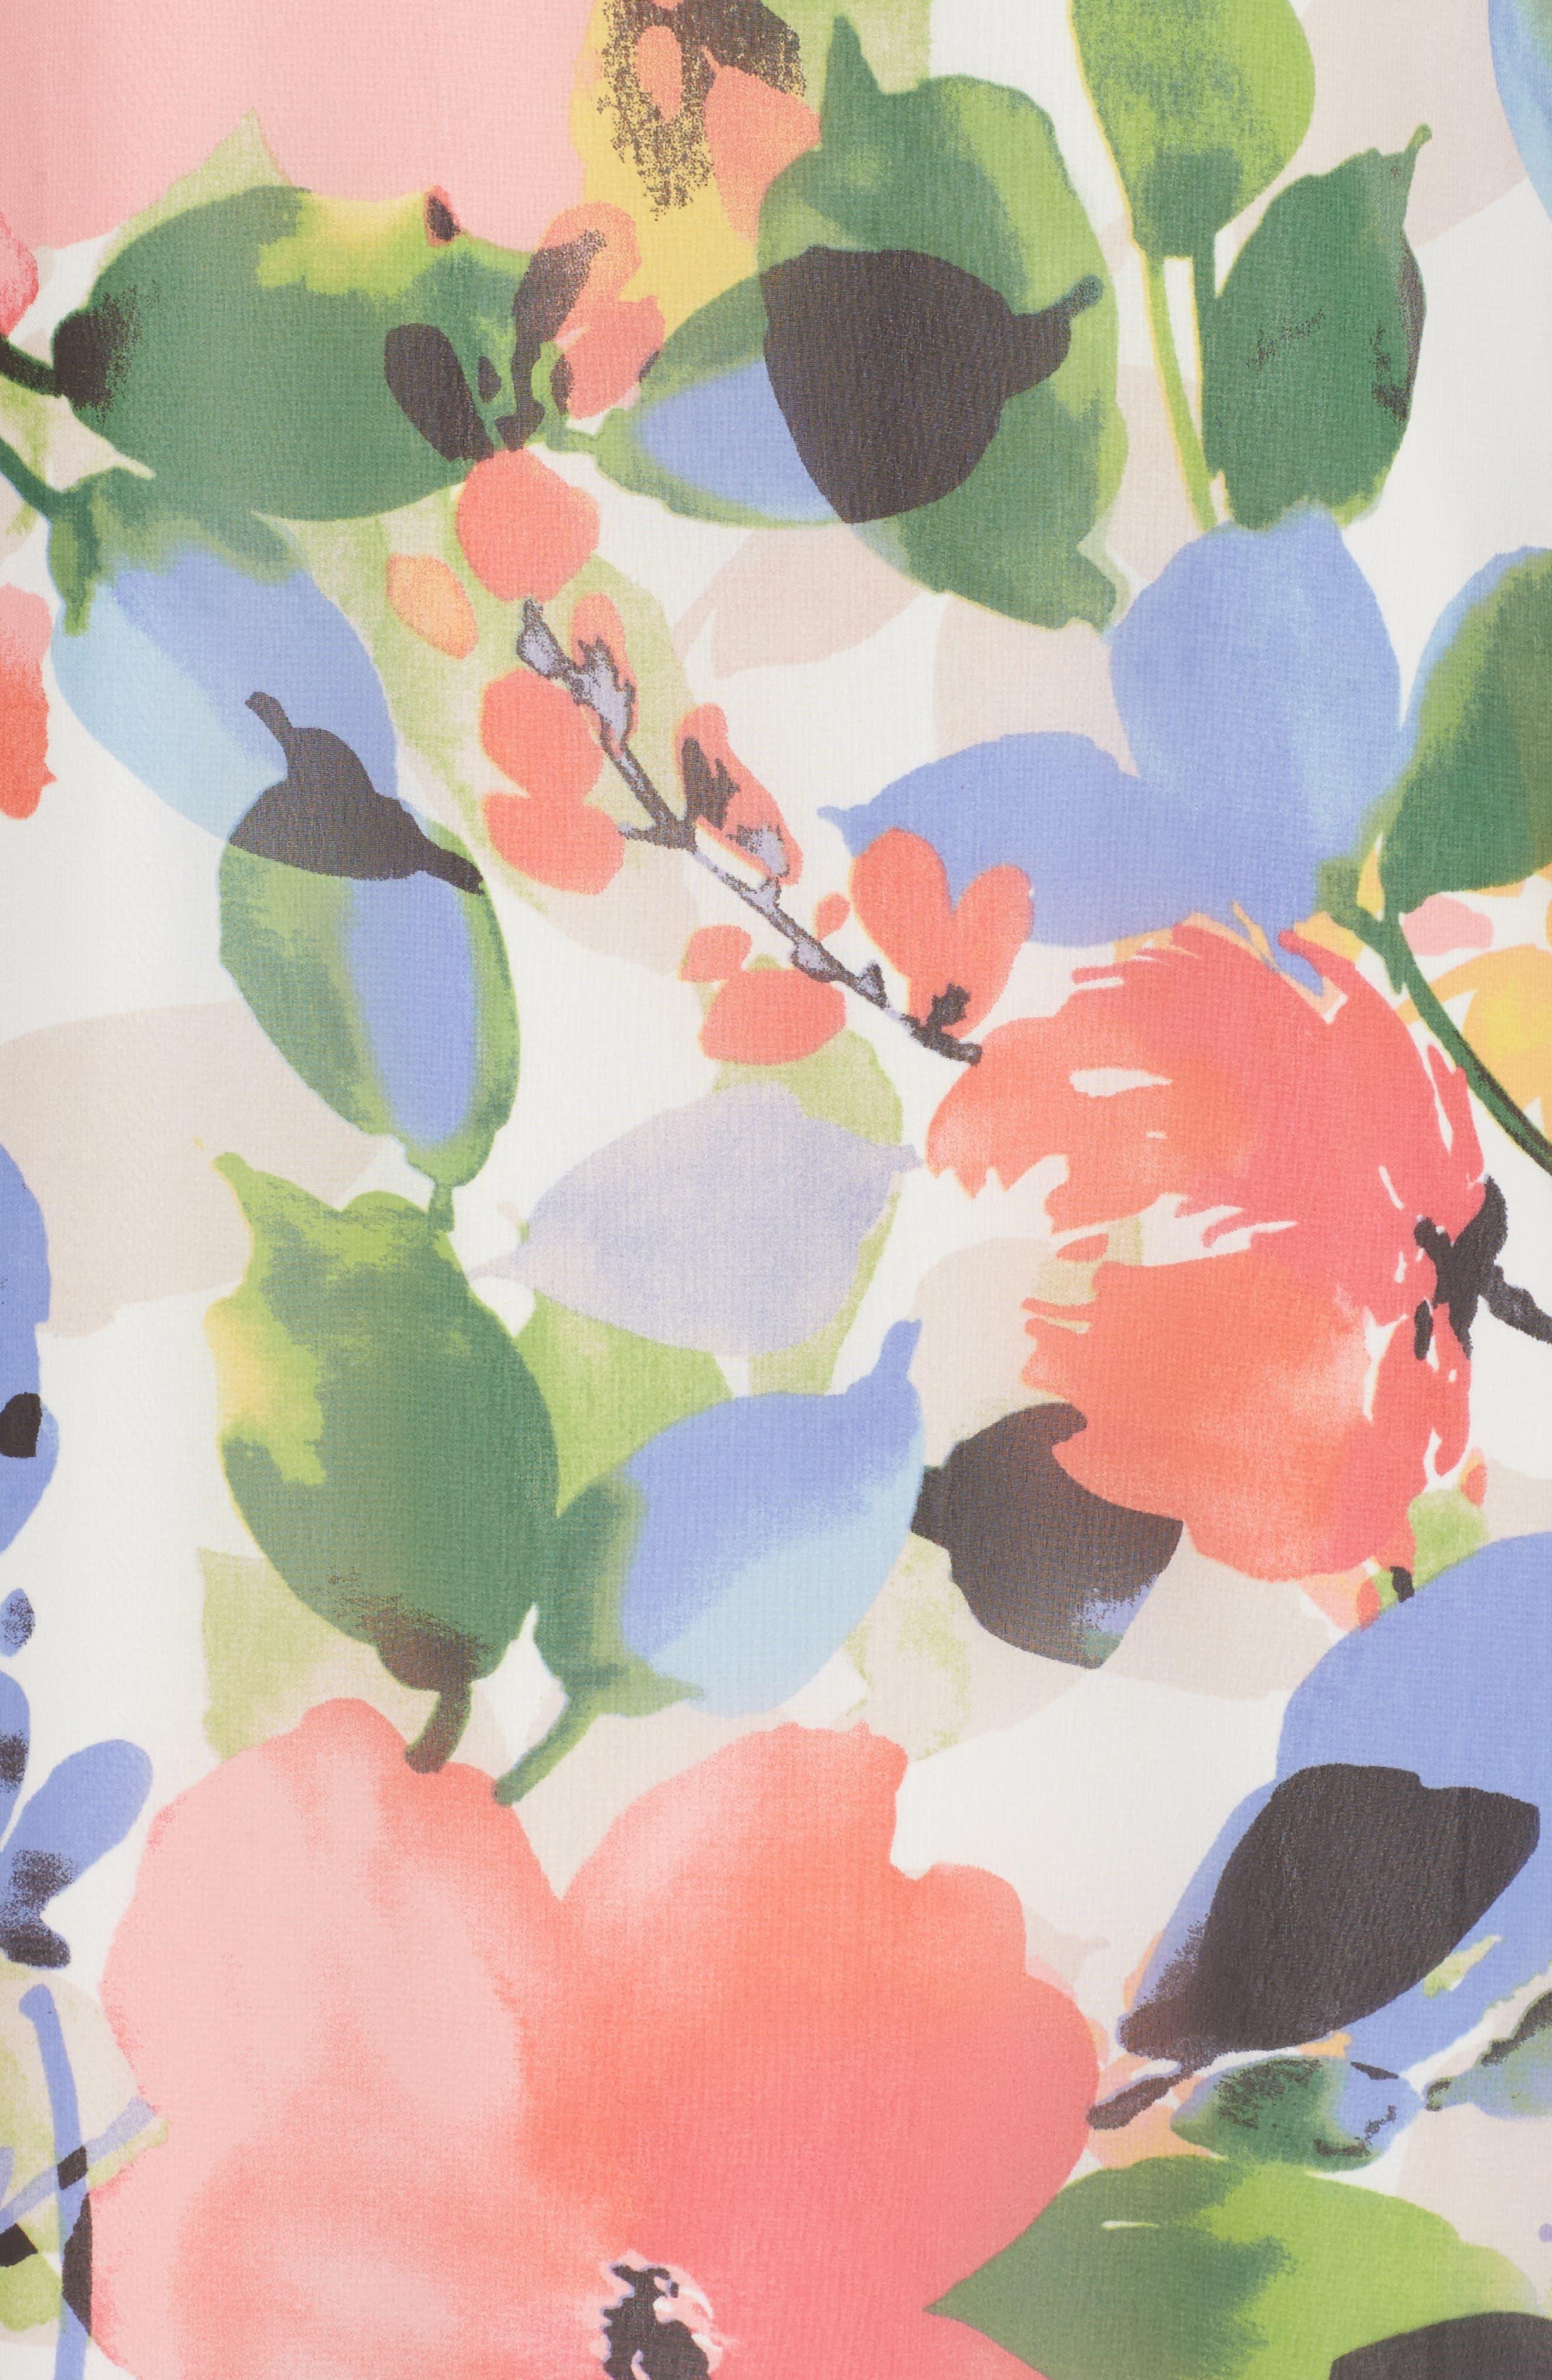 Stretch Sheath Dress,                             Alternate thumbnail 5, color,                             001